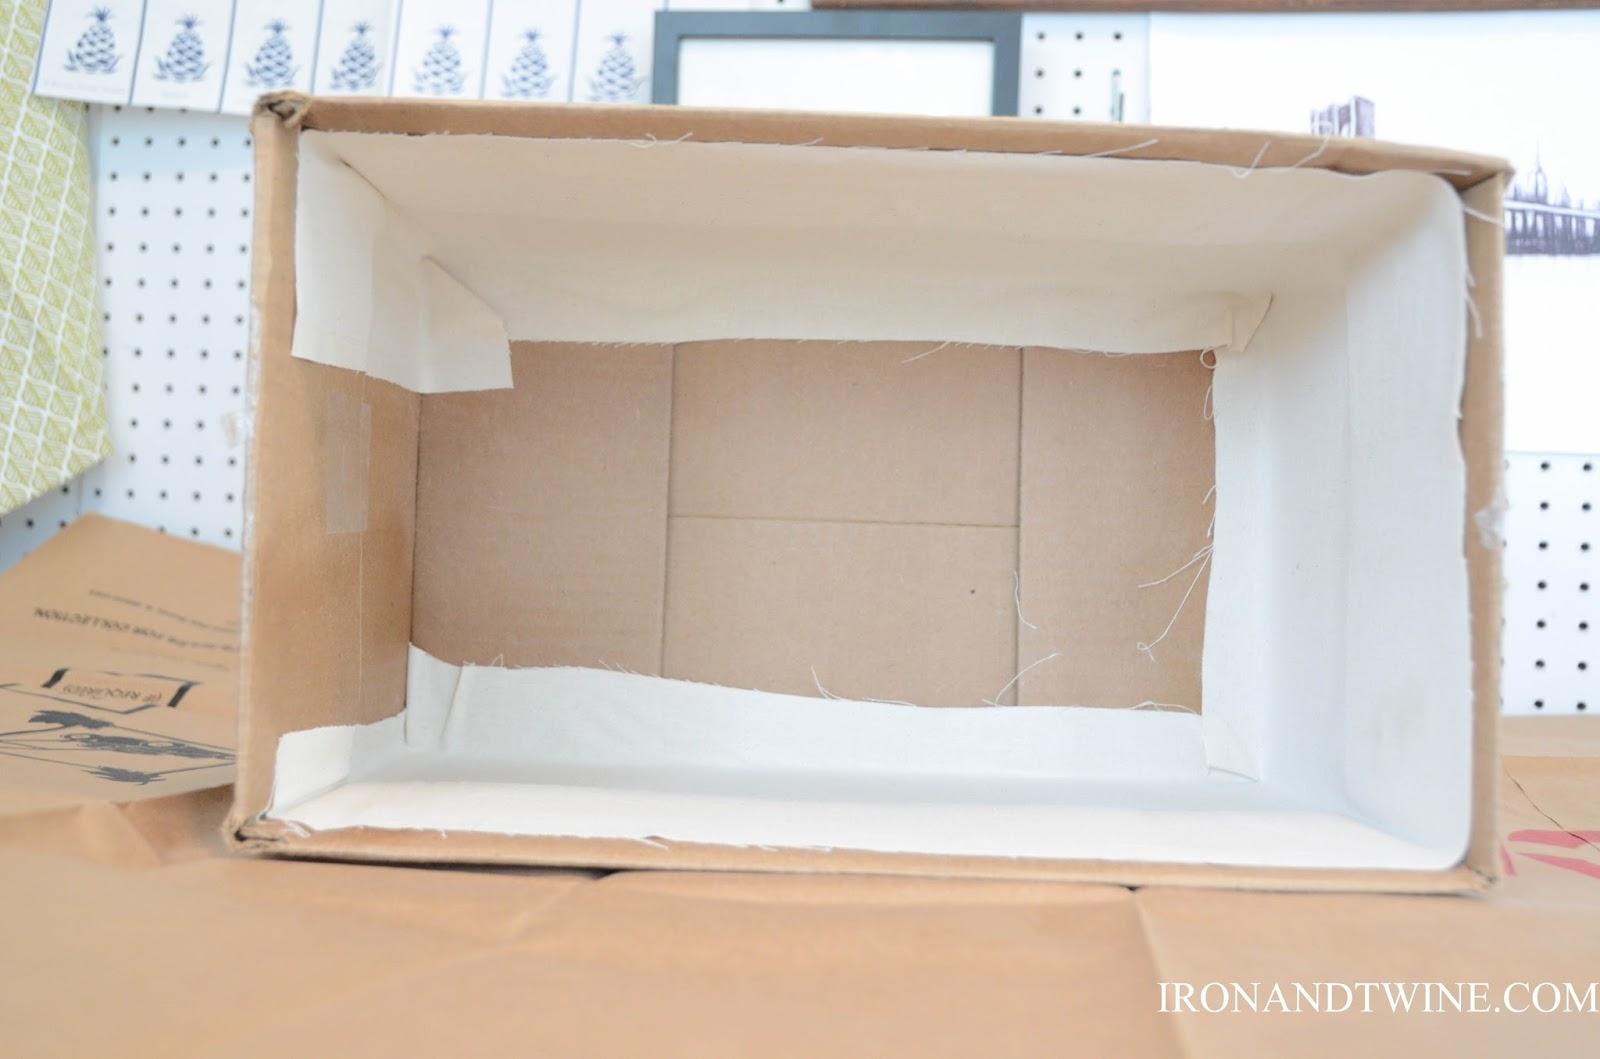 DIY+Belt+Handled+Box,+DIY+fabric+covered+box,+Iron+and+Twine+(19).jpg